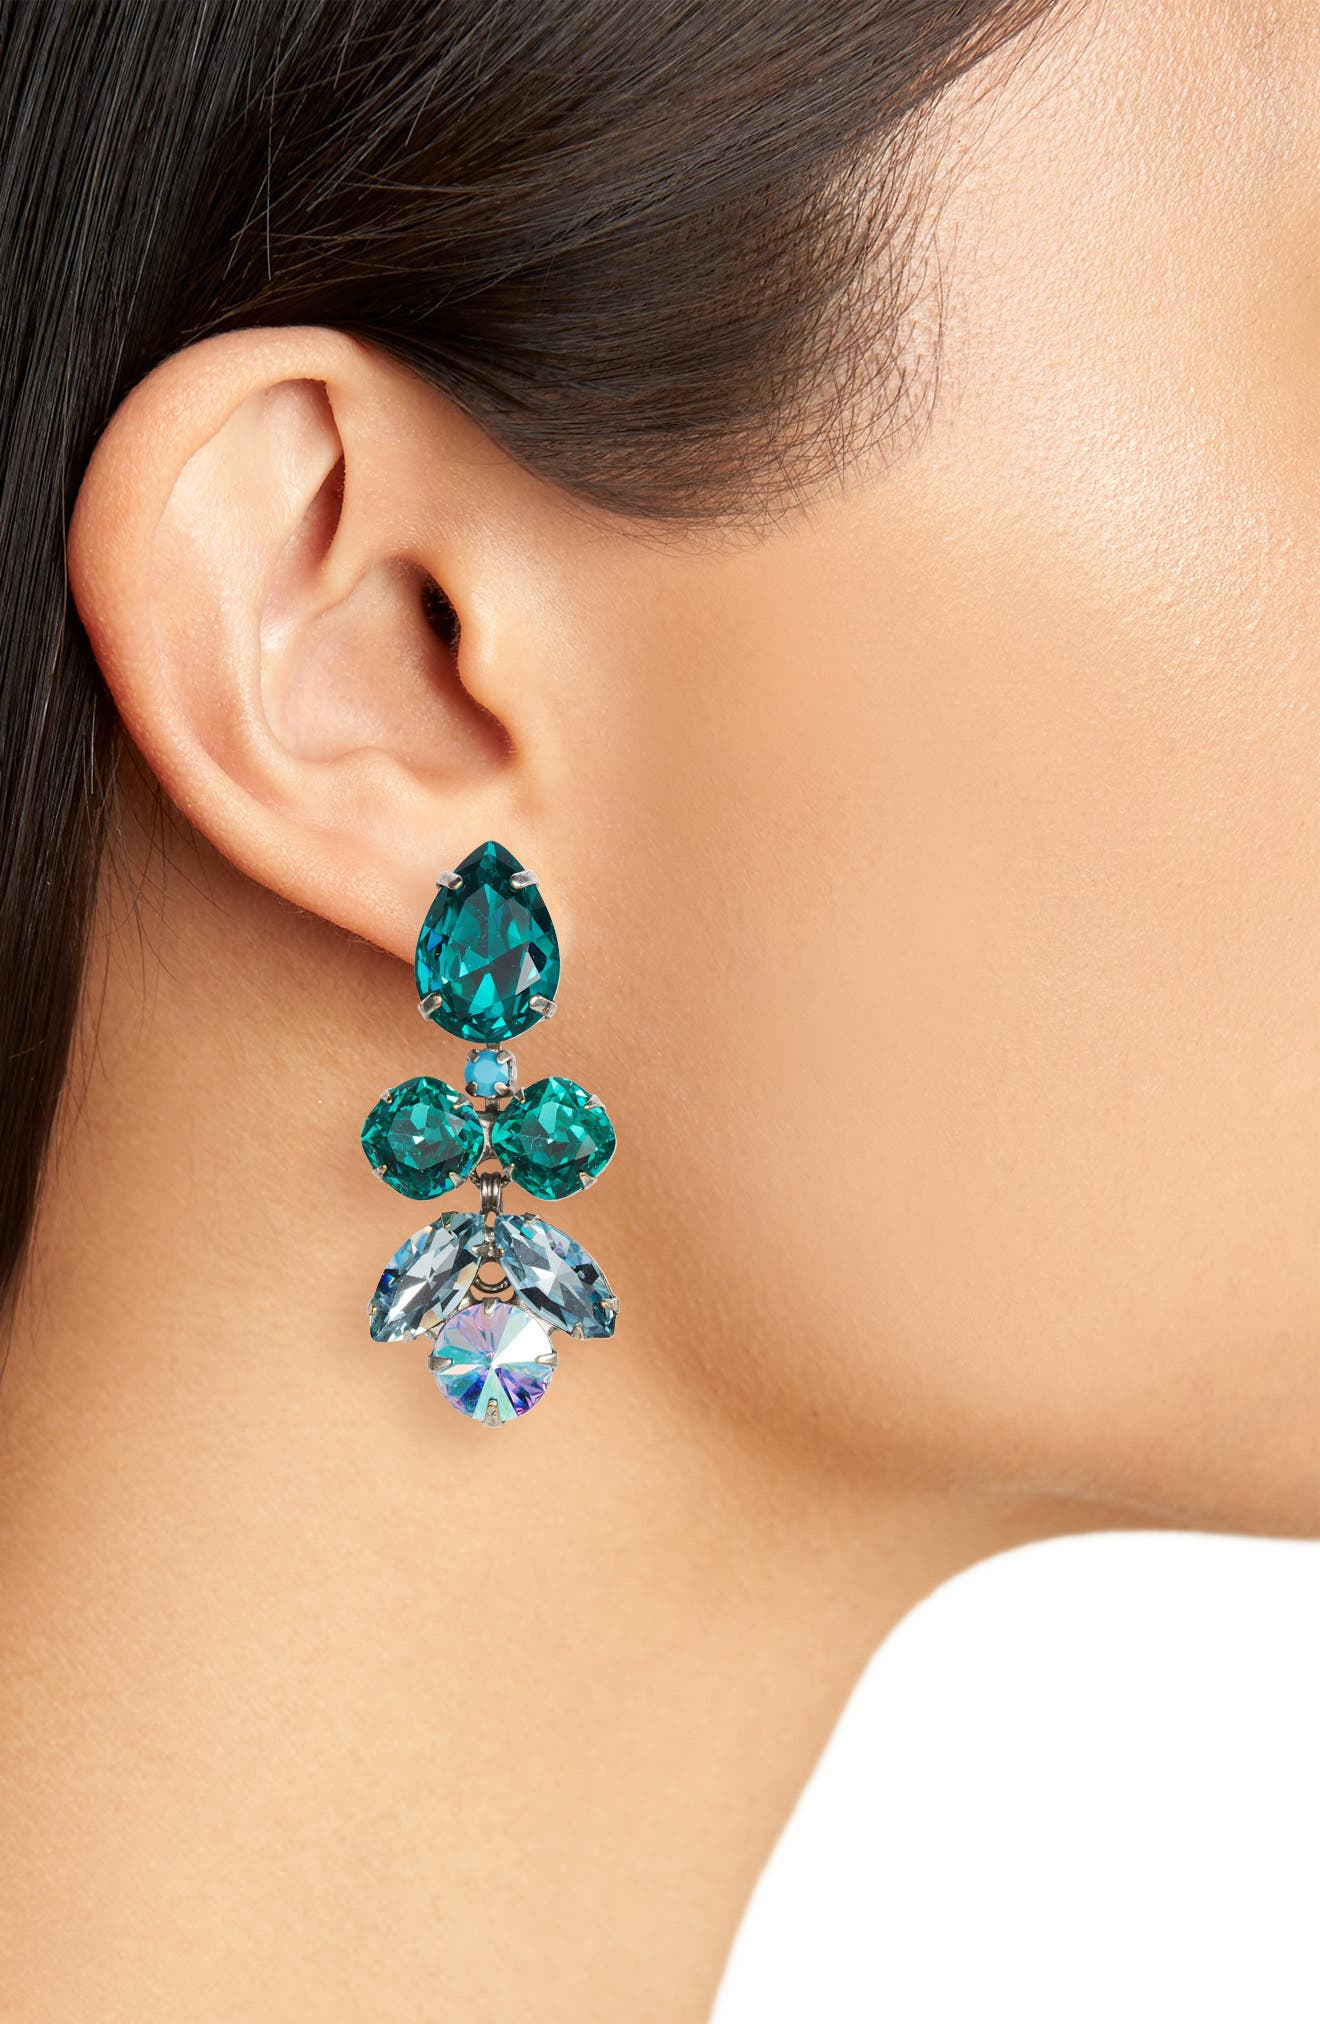 Lotus Flower Crystal Drop Earrings,                             Alternate thumbnail 2, color,                             Blue-Green